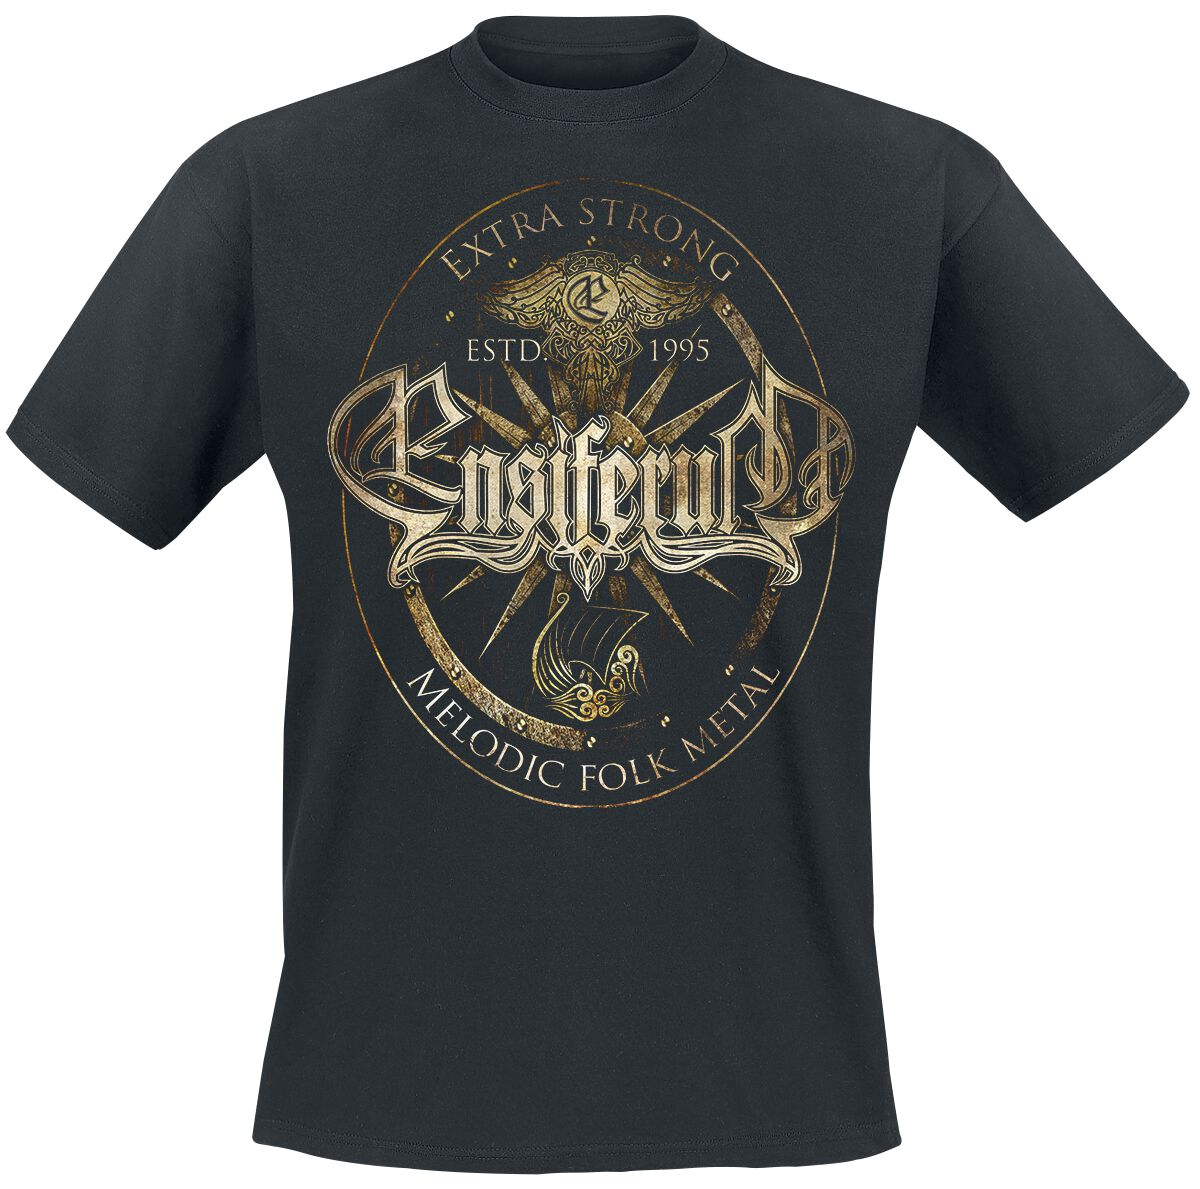 Zespoły - Koszulki - T-Shirt Ensiferum Melodic Folk Metal T-Shirt czarny - 353697